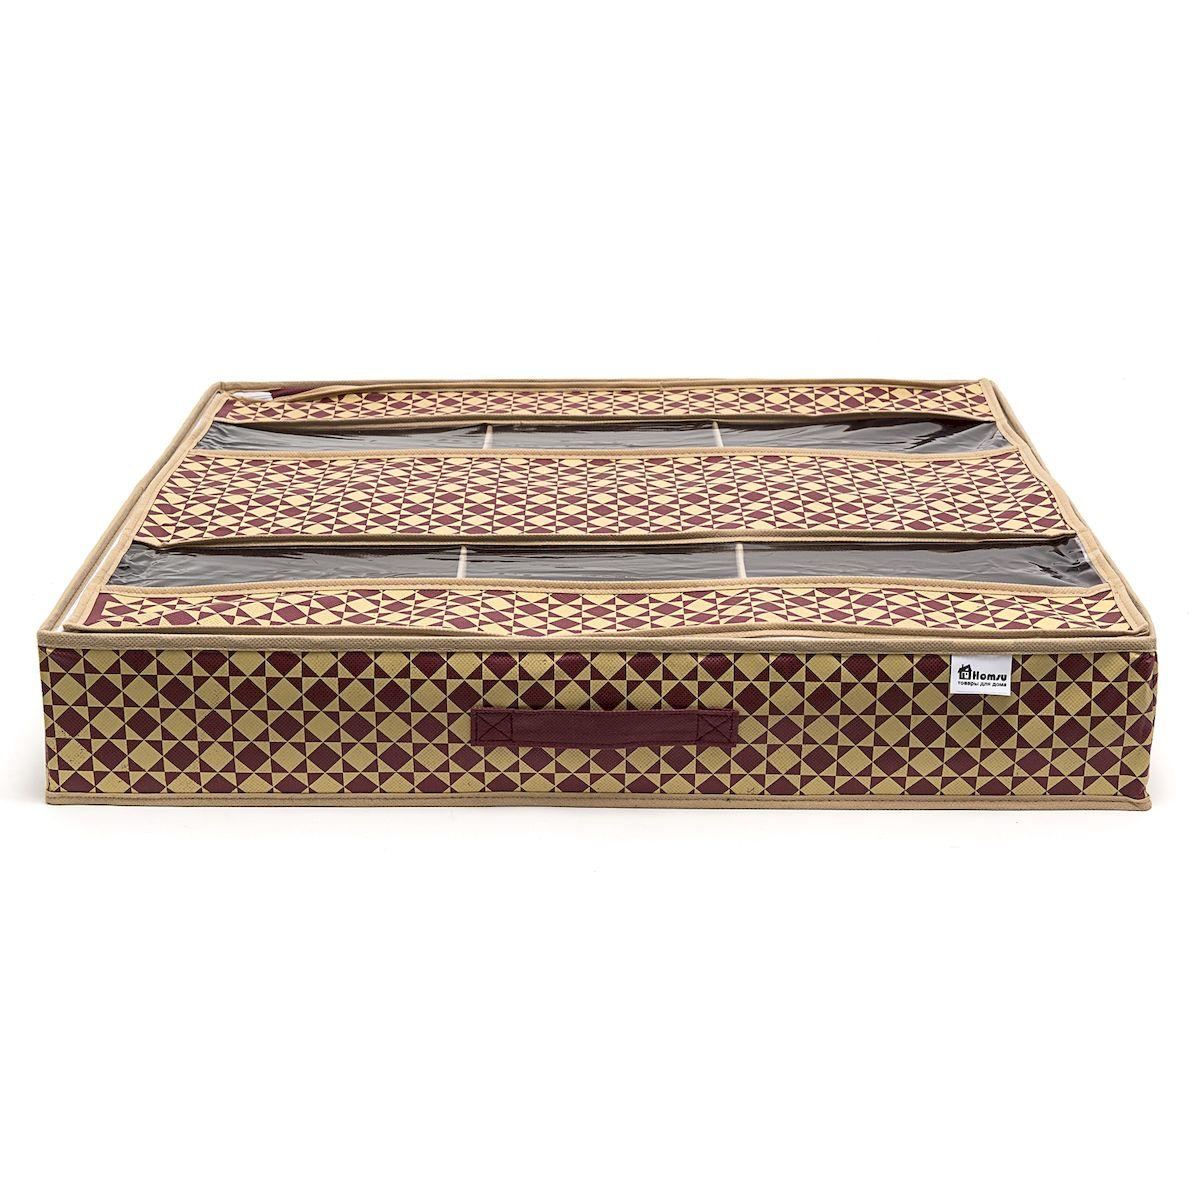 Органайзер для обуви Homsu Bordo, 66 х 63 х 11 см